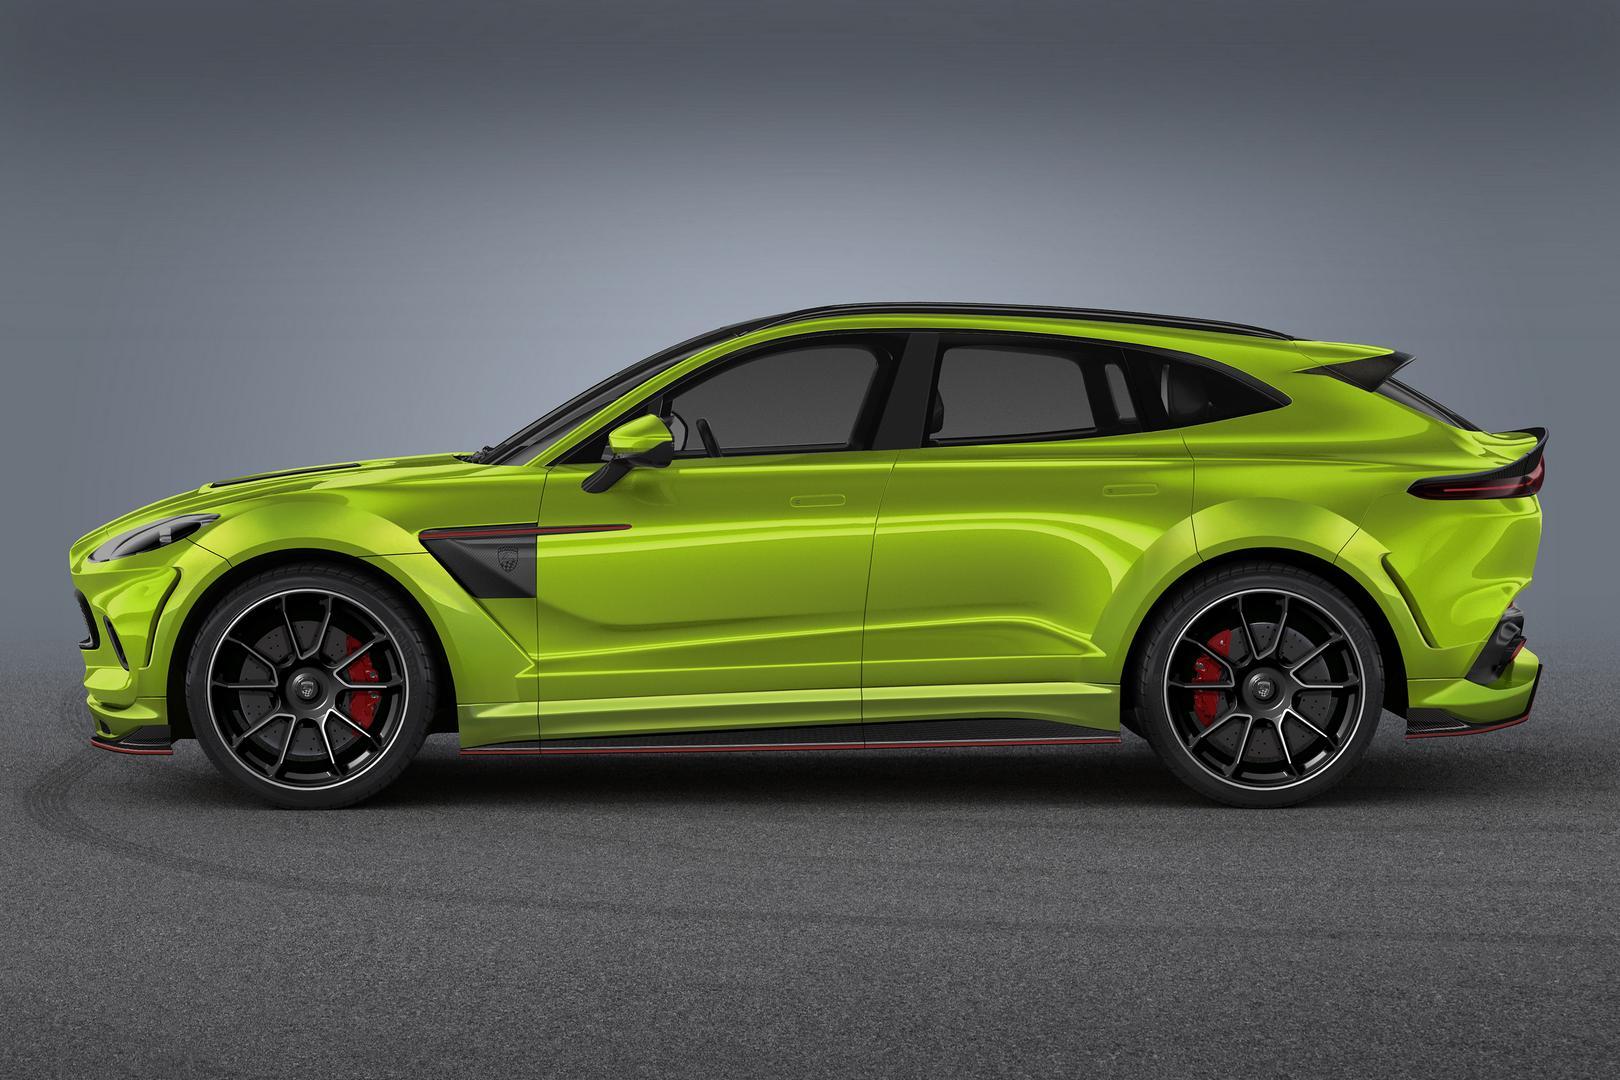 Green Aston Martin DBX Side